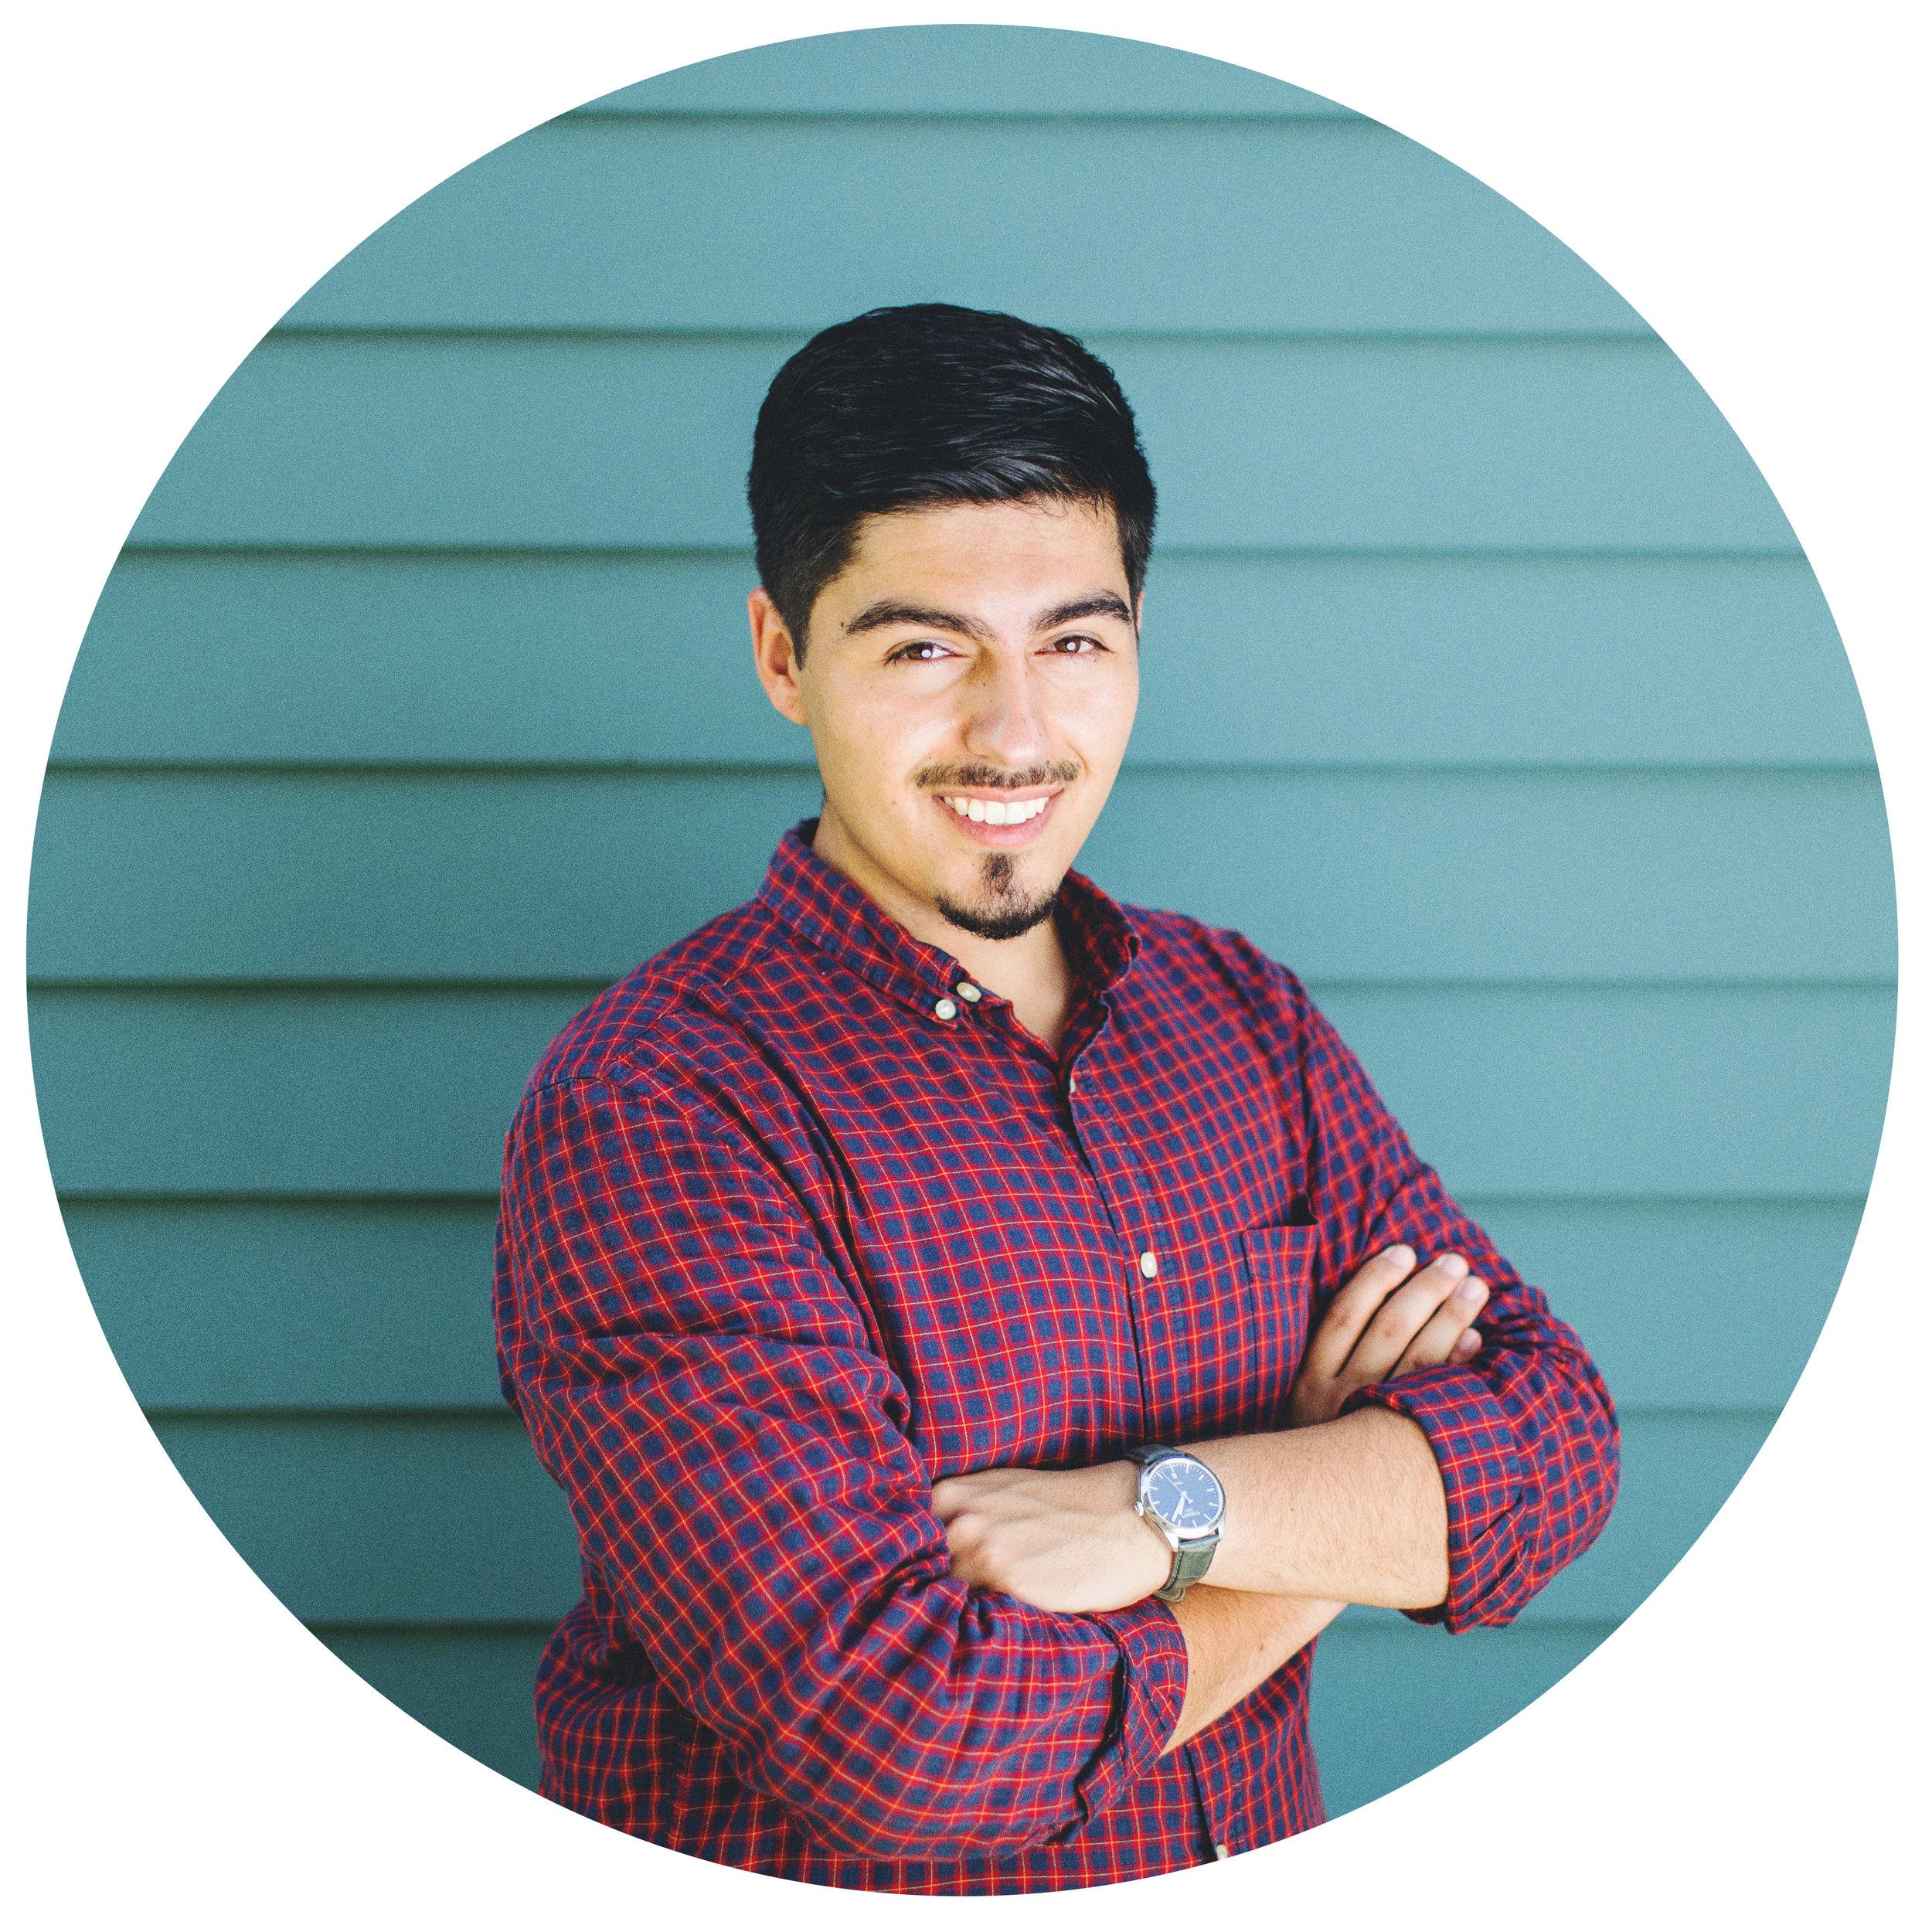 Sean valdivieso - Cinematographer and Editor